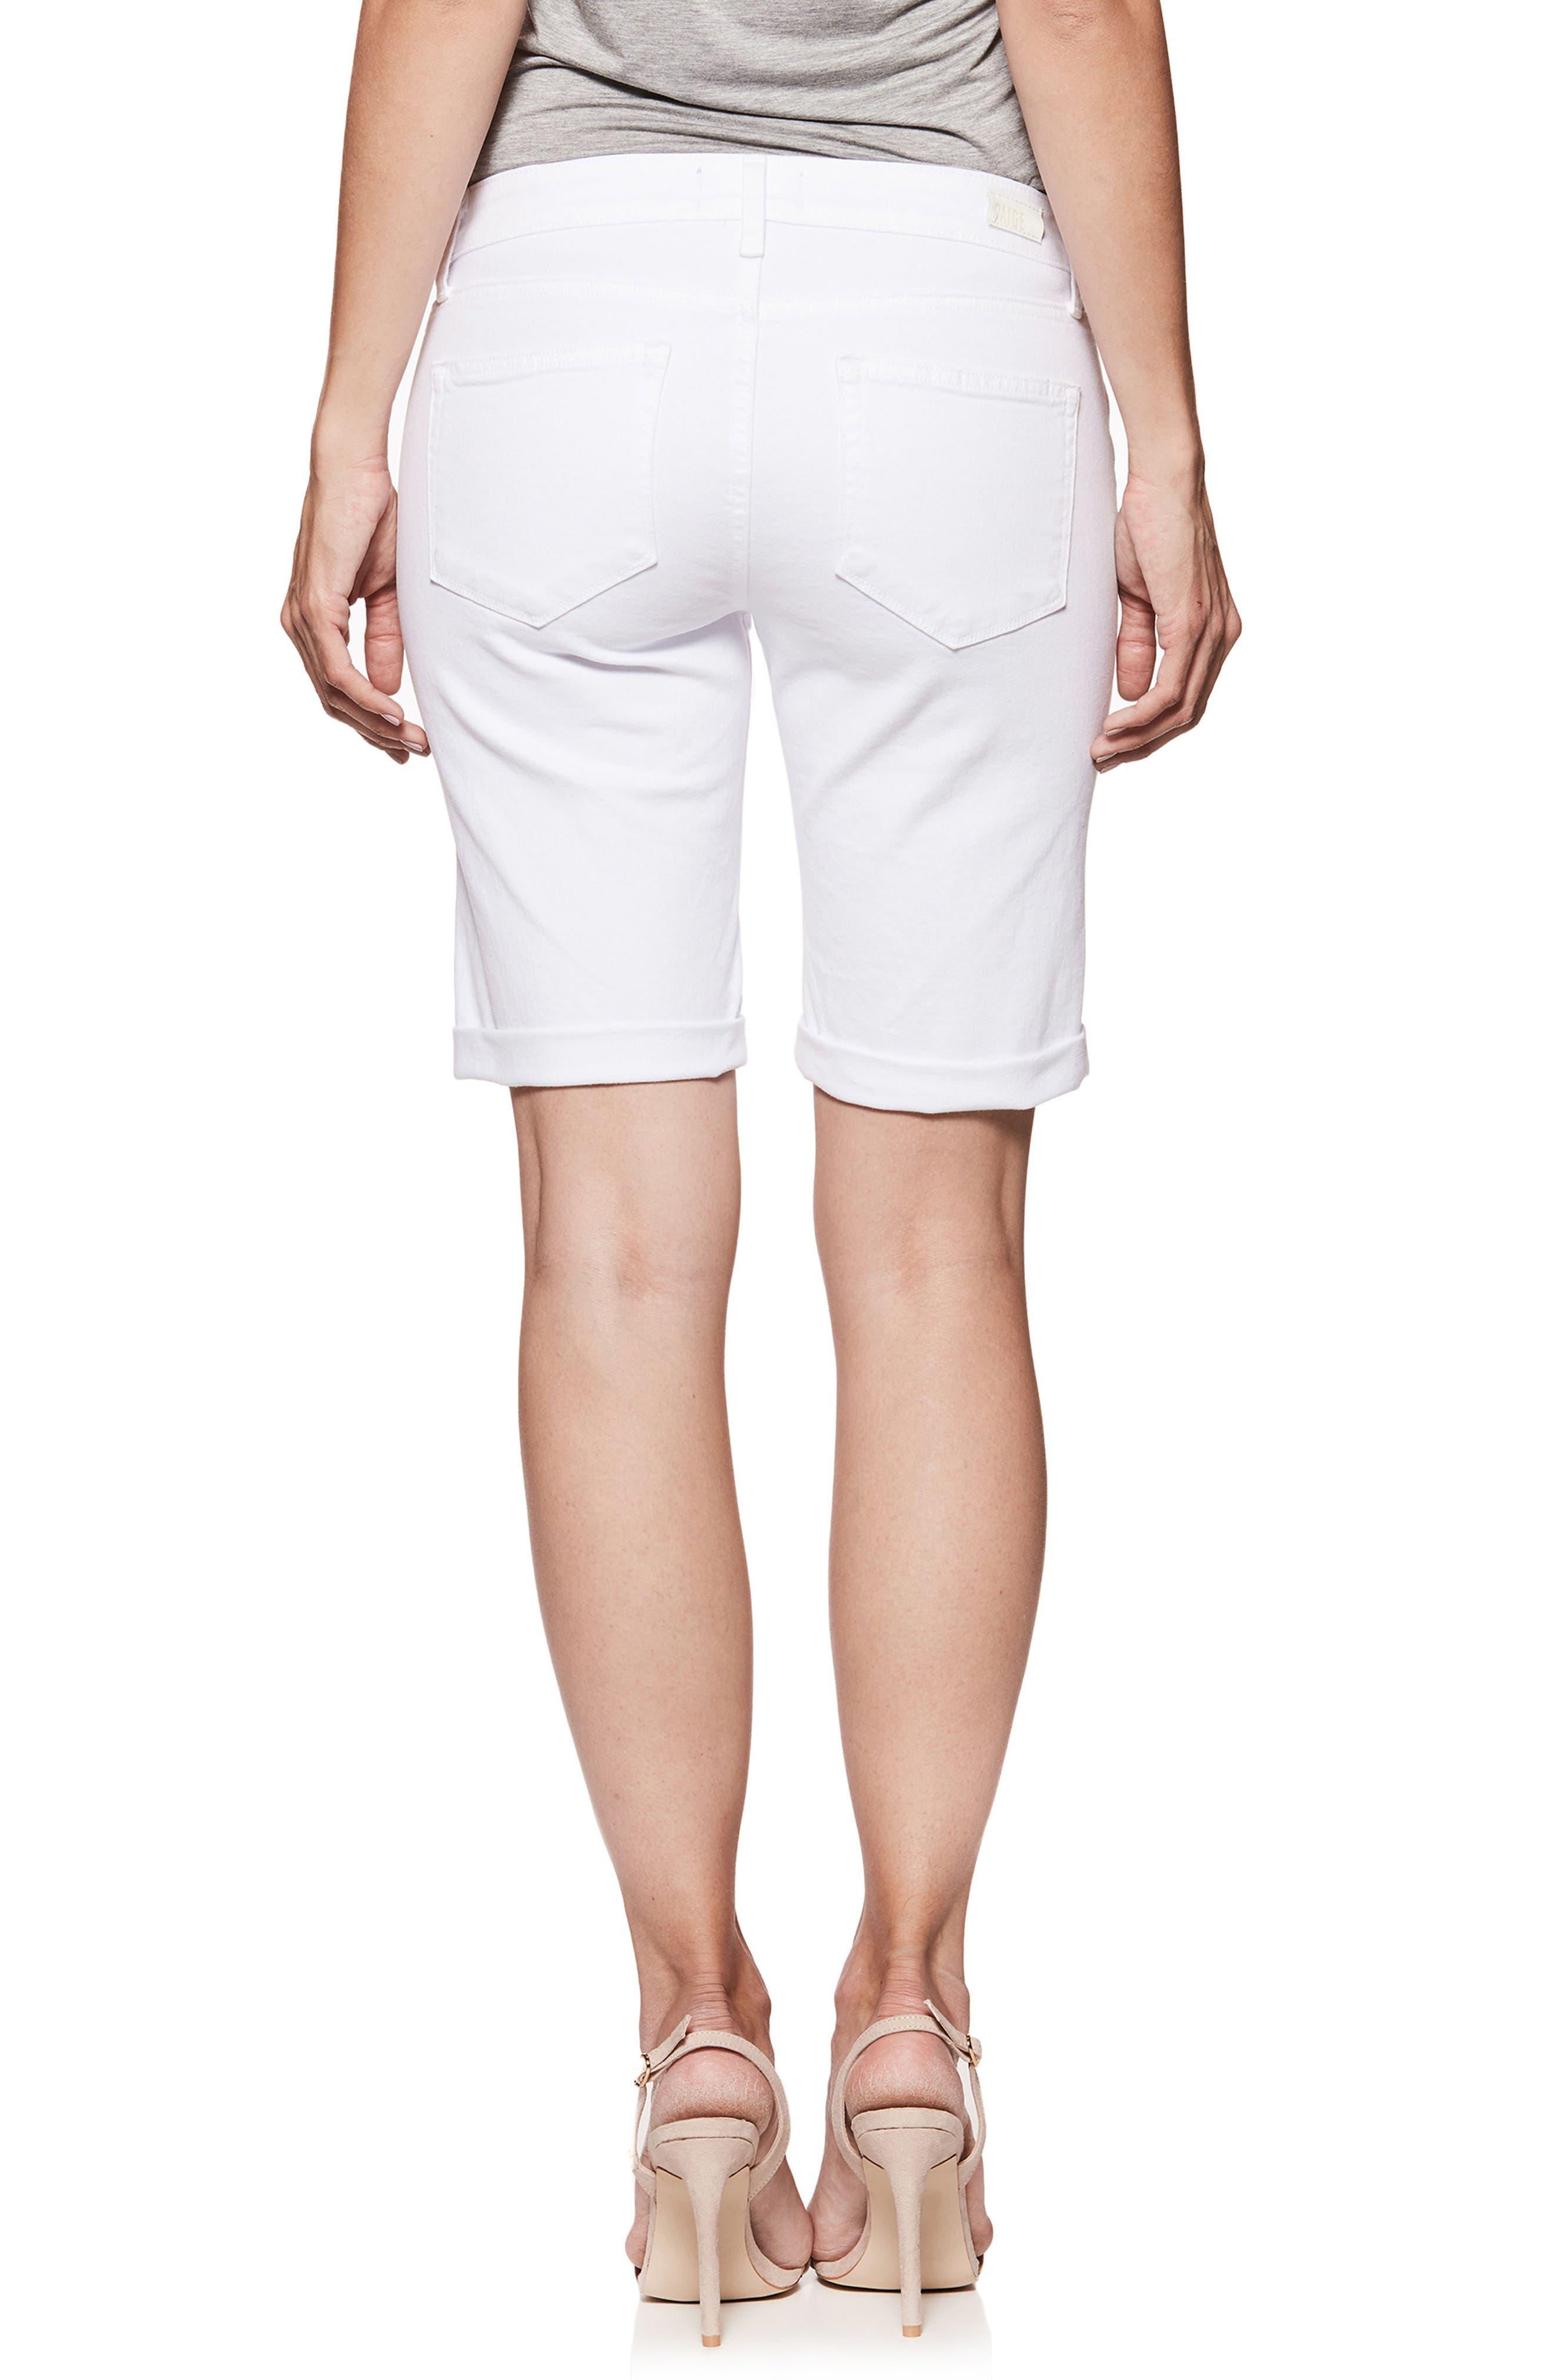 Jax Denim Bermuda Shorts,                             Alternate thumbnail 3, color,                             Crisp White